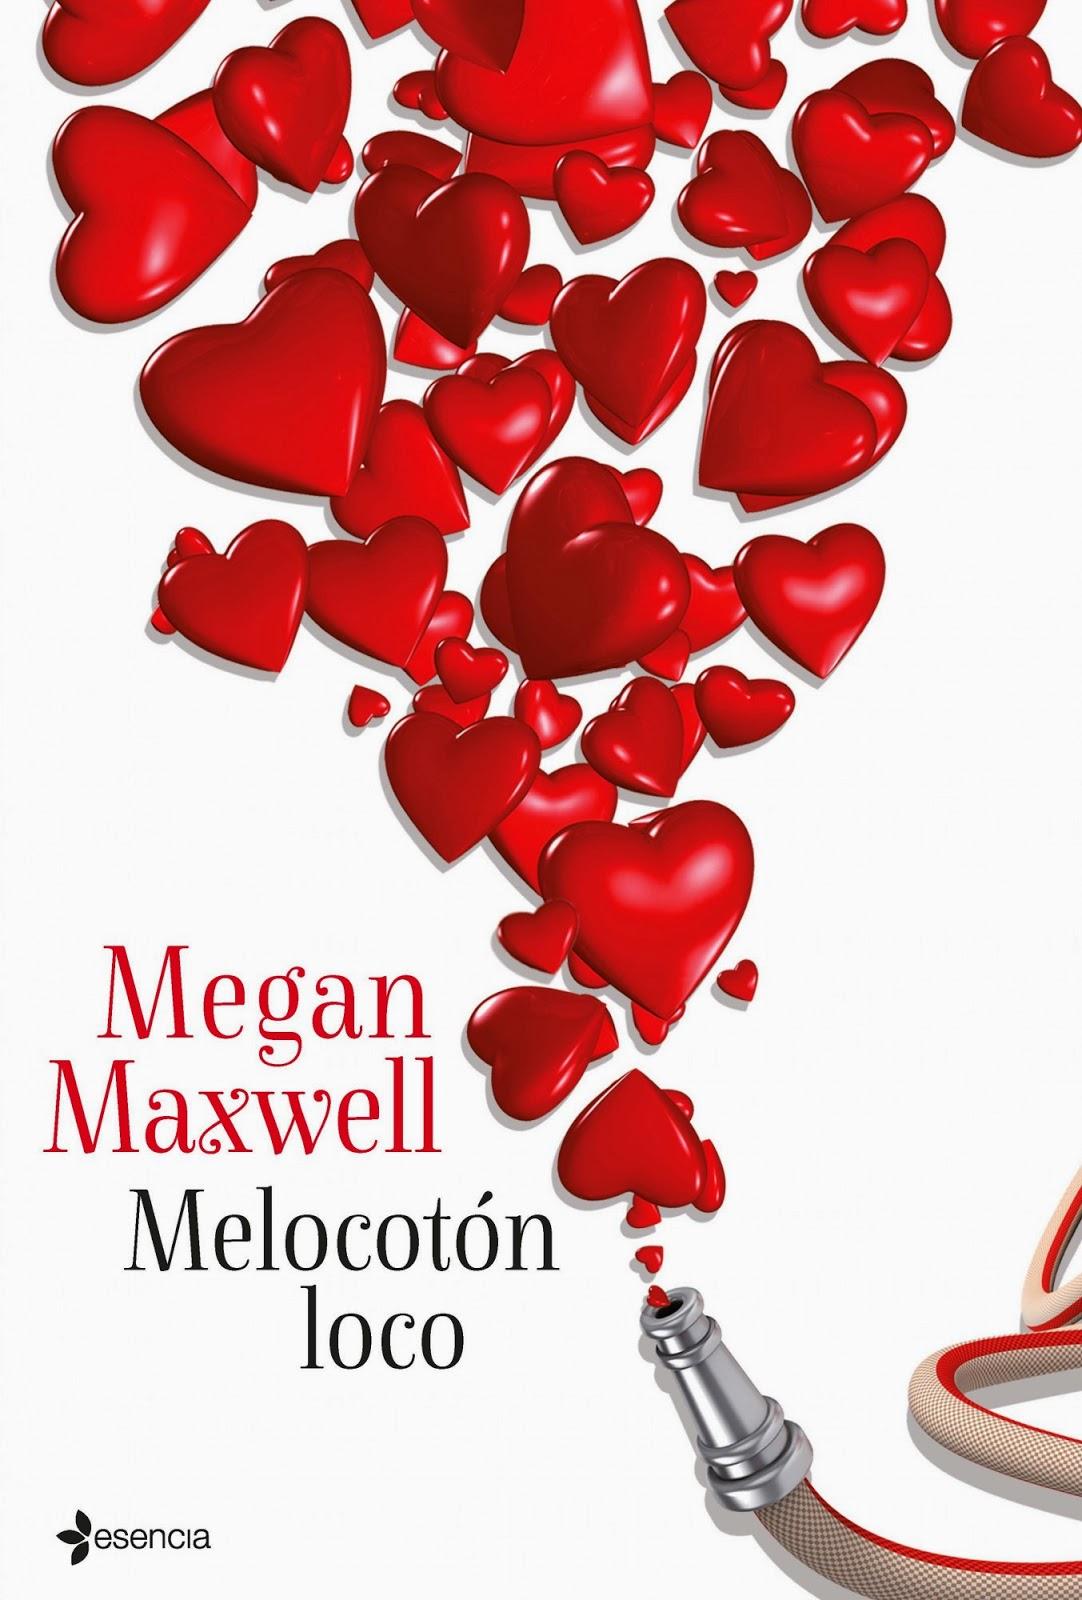 melocoton-loco-pdf